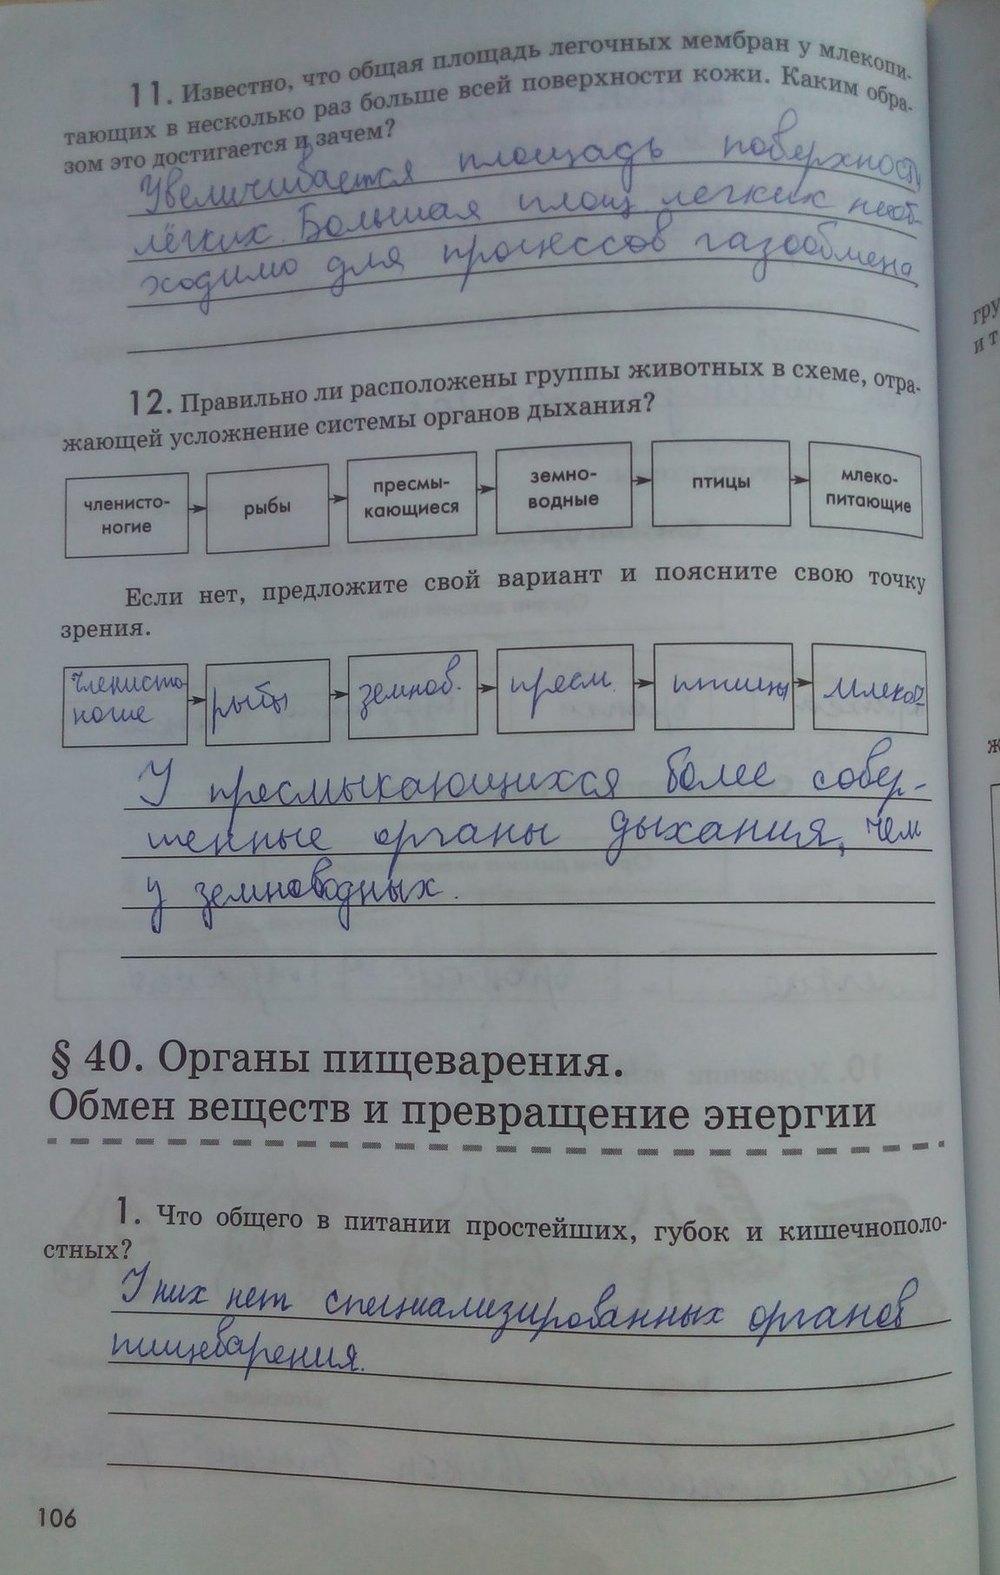 Гдз по биологии 6 класс лапшина учебник